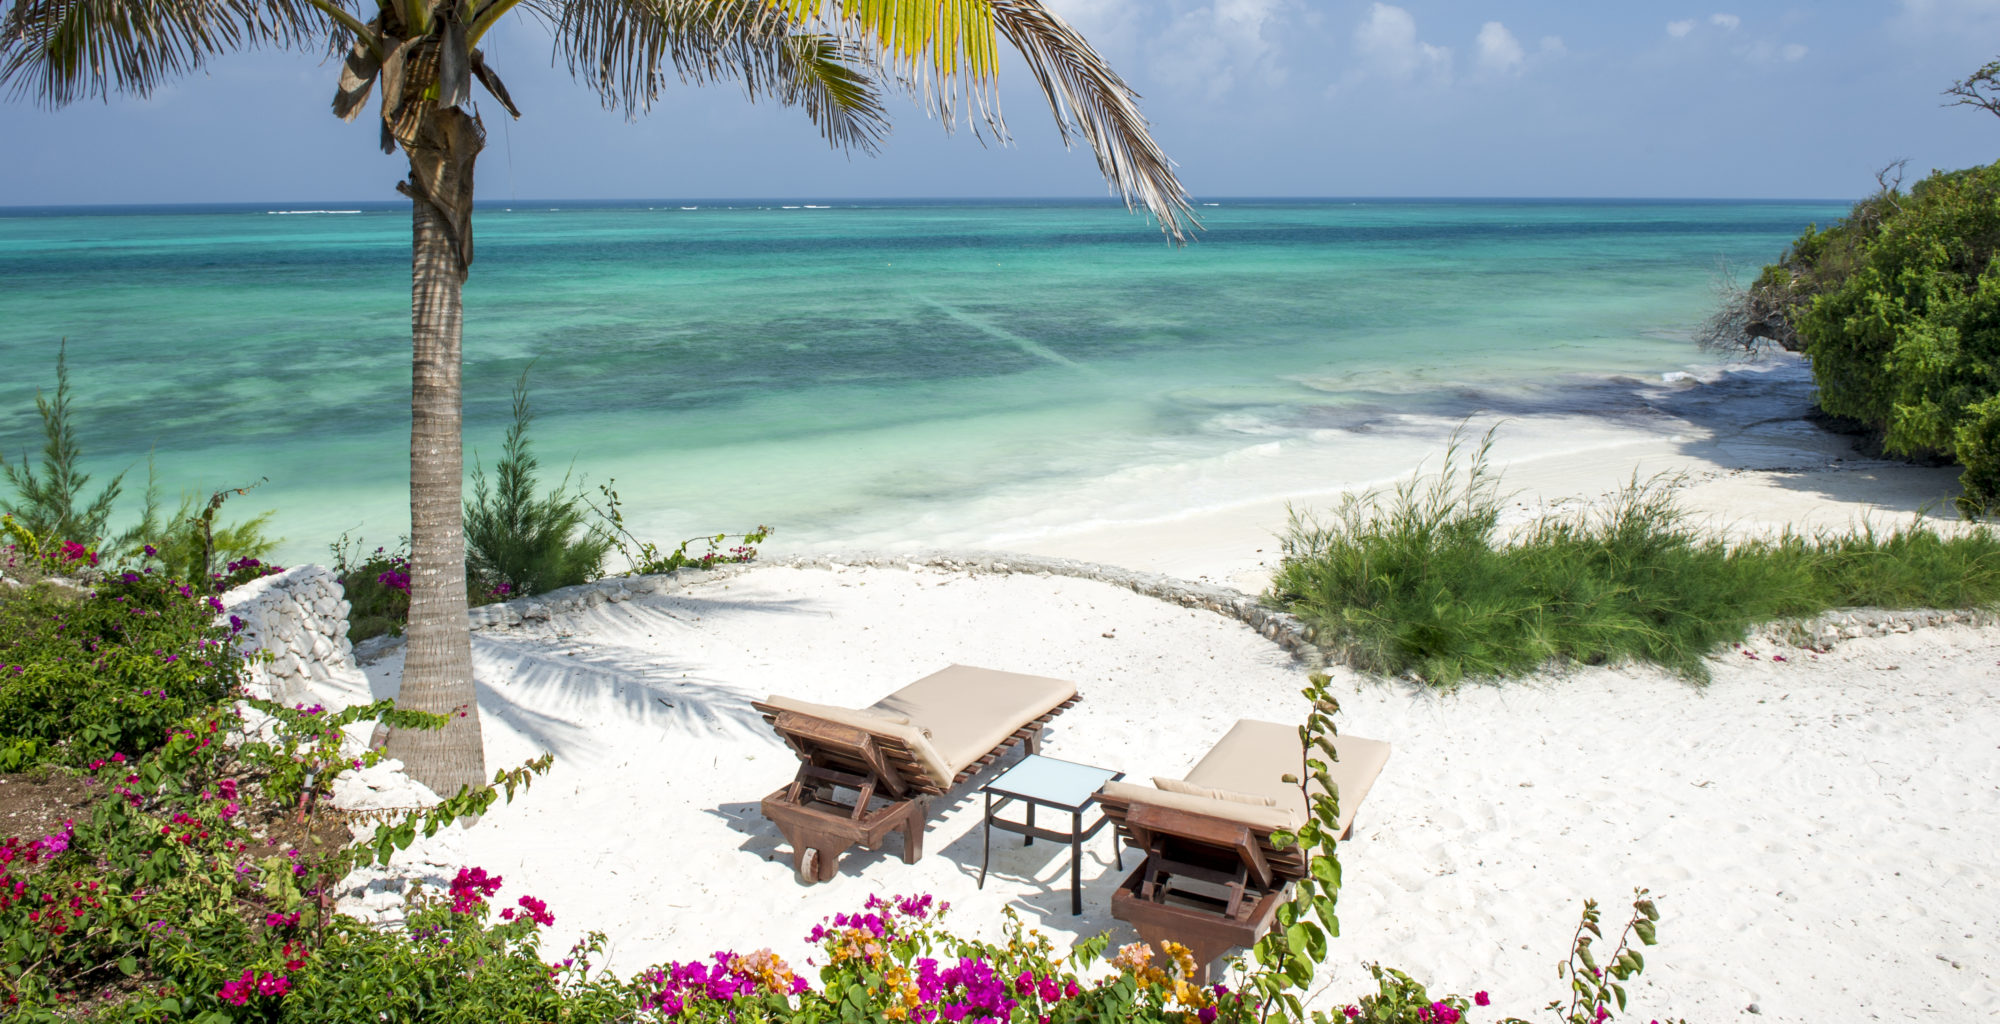 Tanzania-Zawadi-Beach-Lounger